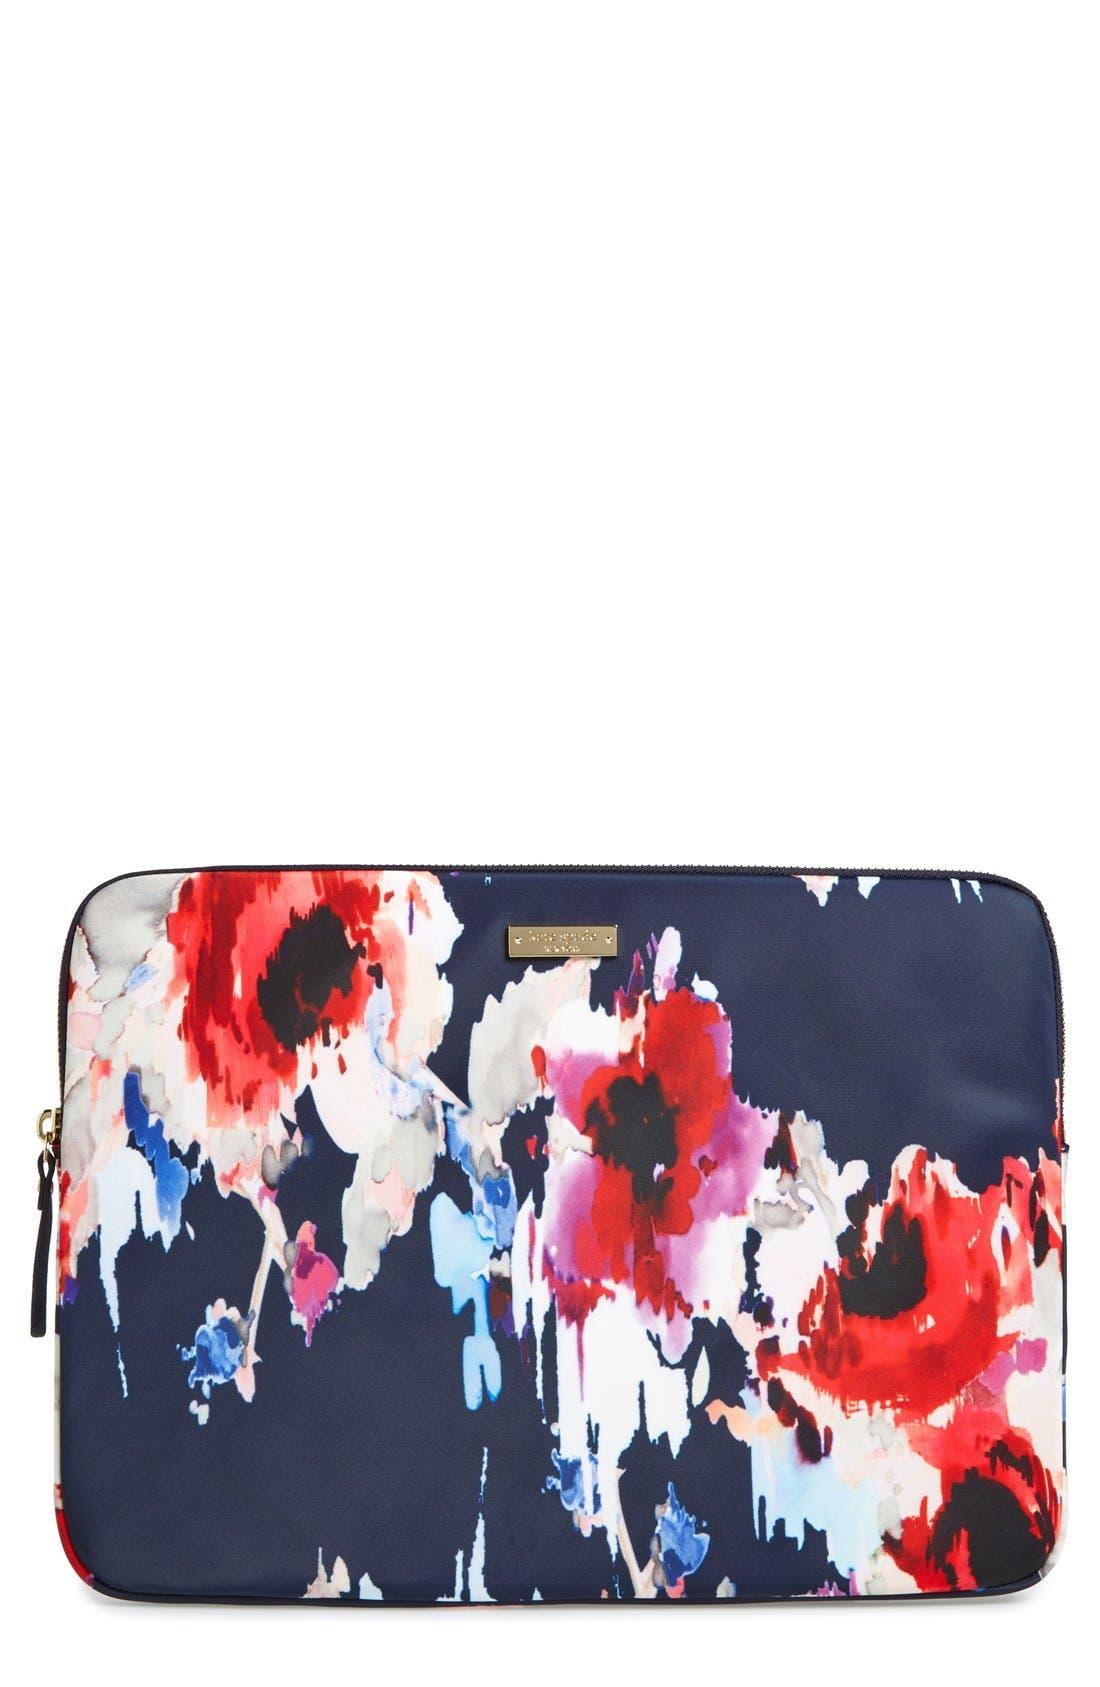 Main Image - kate spade new york 'hazy floral' laptop sleeve (13 inch)